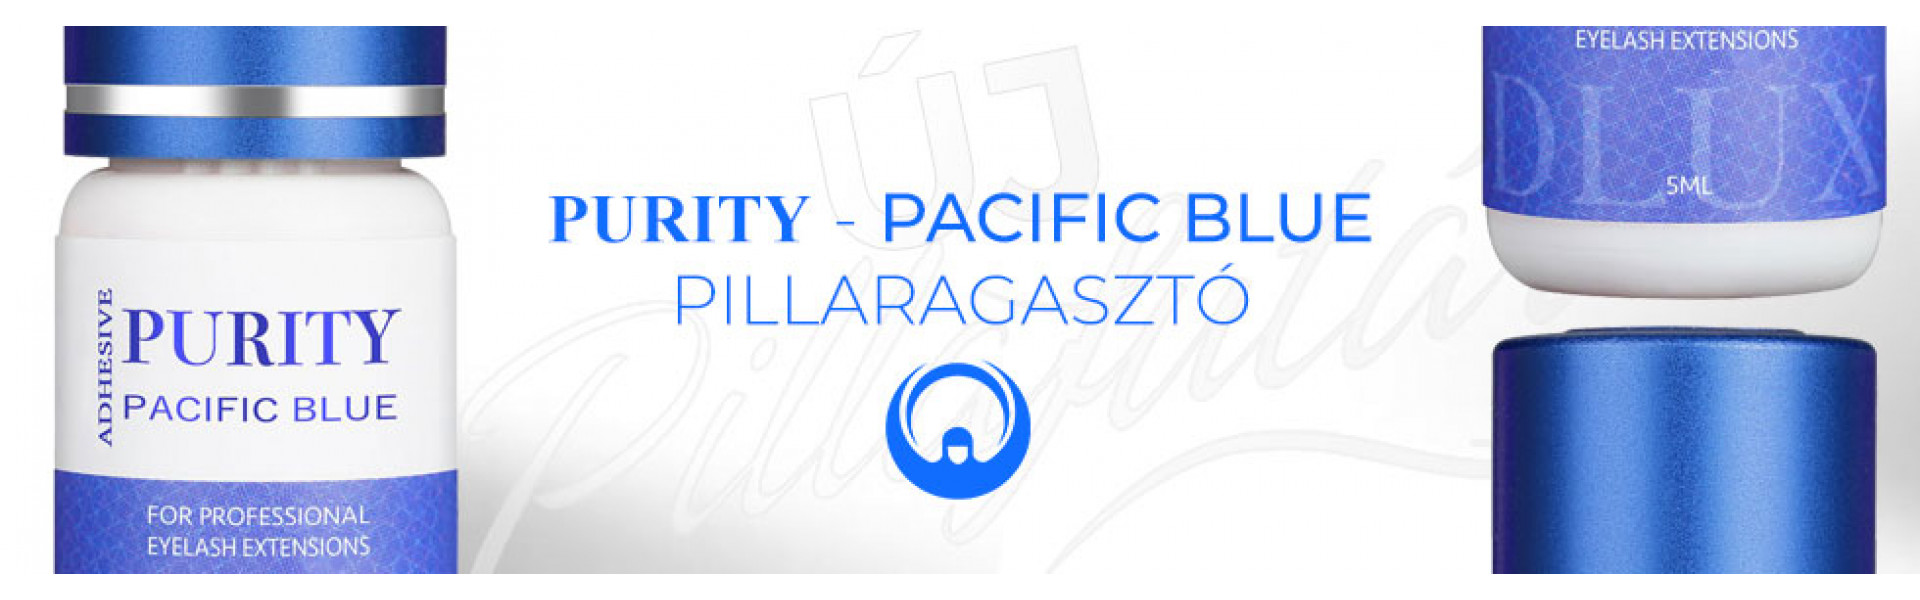 Dlux Professional ragasztó - PURITY PACIFIC BLUE 5ml